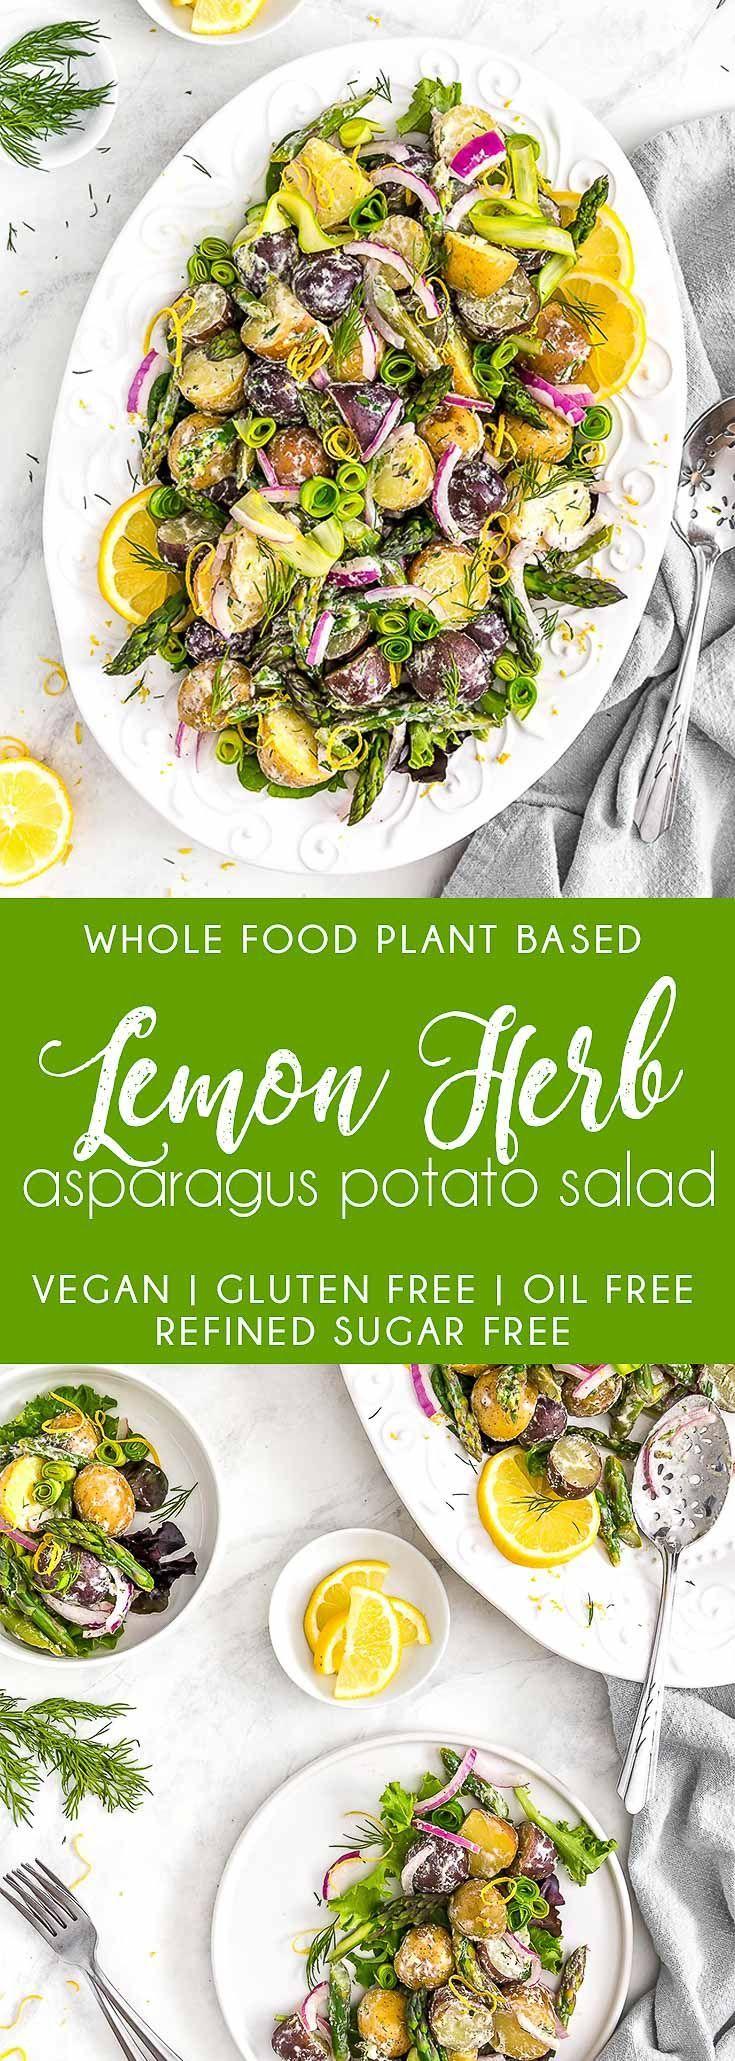 DELICIOUS Lemon Herb Asparagus Potato Salad! Perfect addition to picnics and parties! #vegan #glutenfree #oilfree #potatosalad #plantbasedrecipes #veganrecipes #plantbased #refinedsugarfree #healthy #healthyvegan #monkeyandmekitchenadventures #recipe